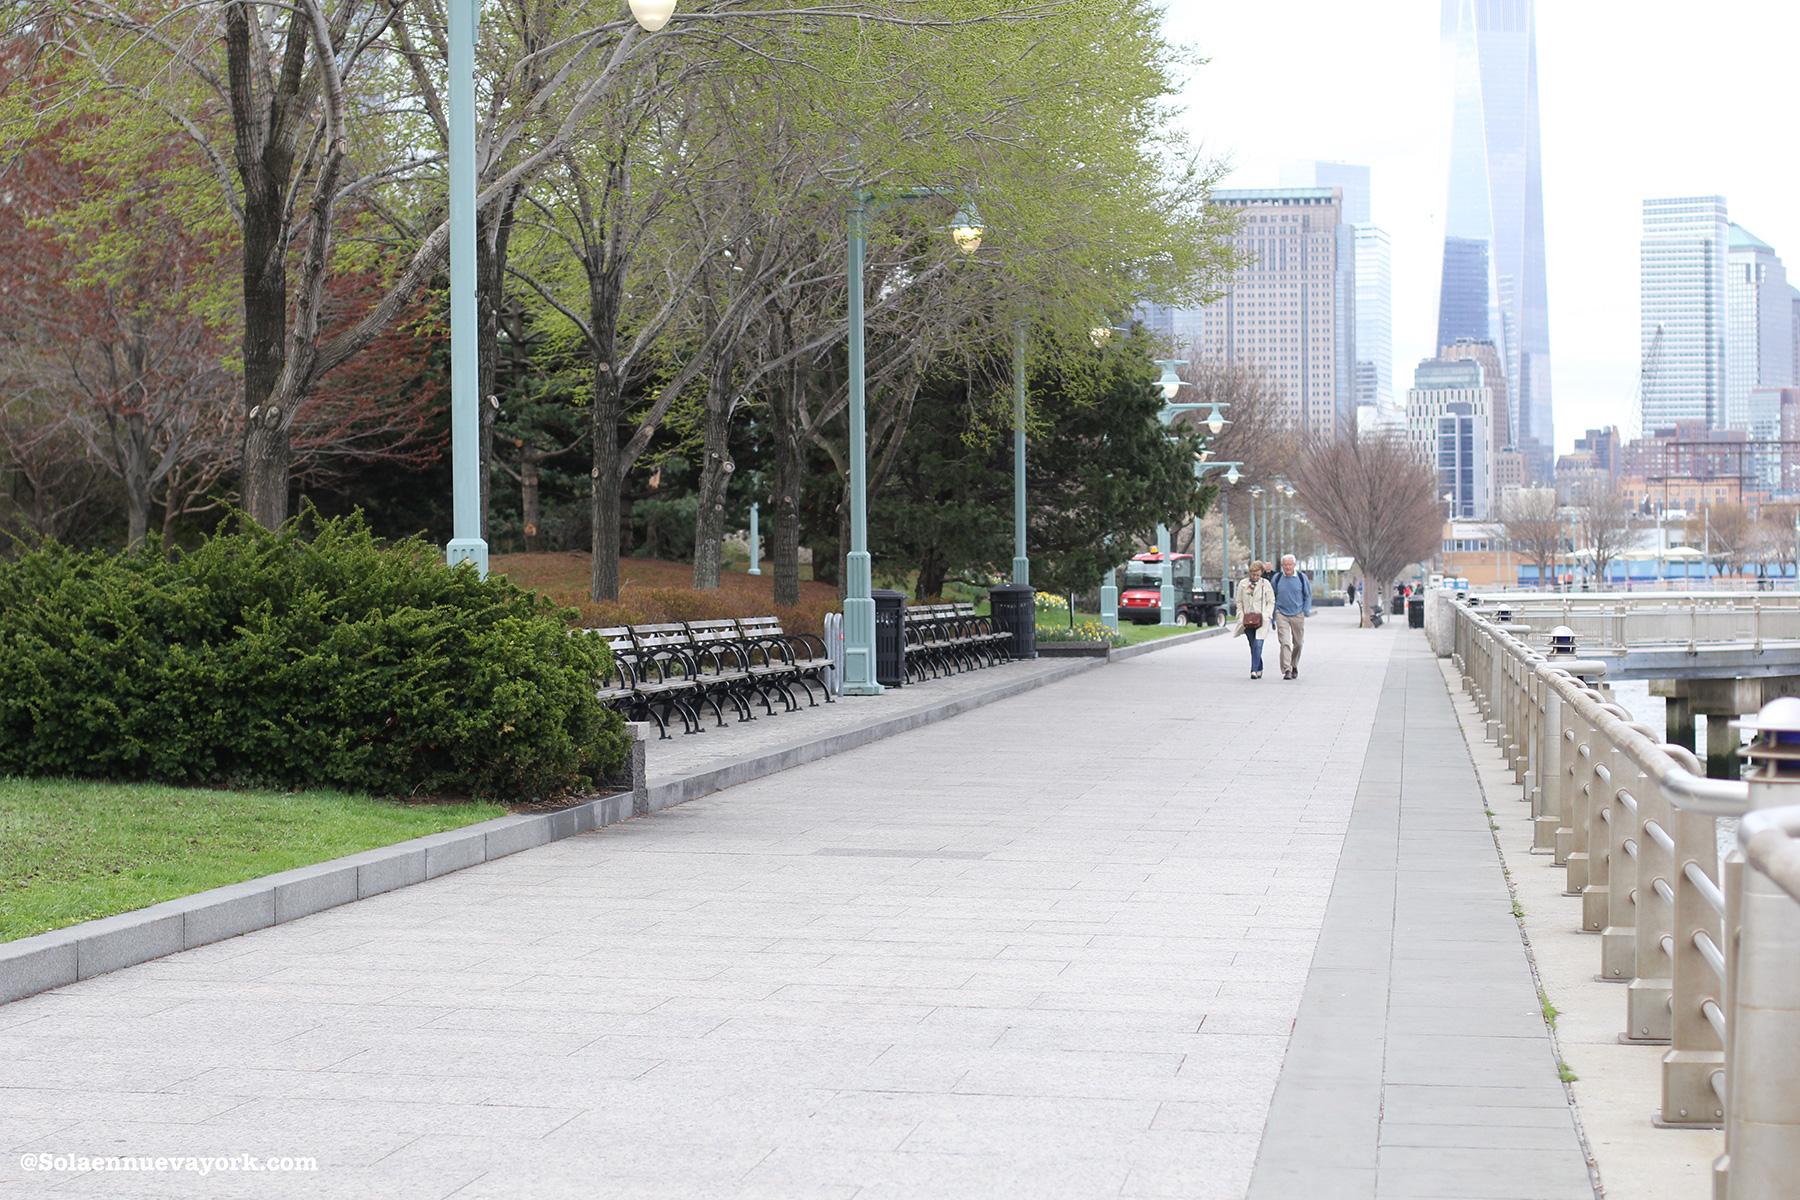 Un paseo por hudson river park sola en nueva york viajes for Hudson park